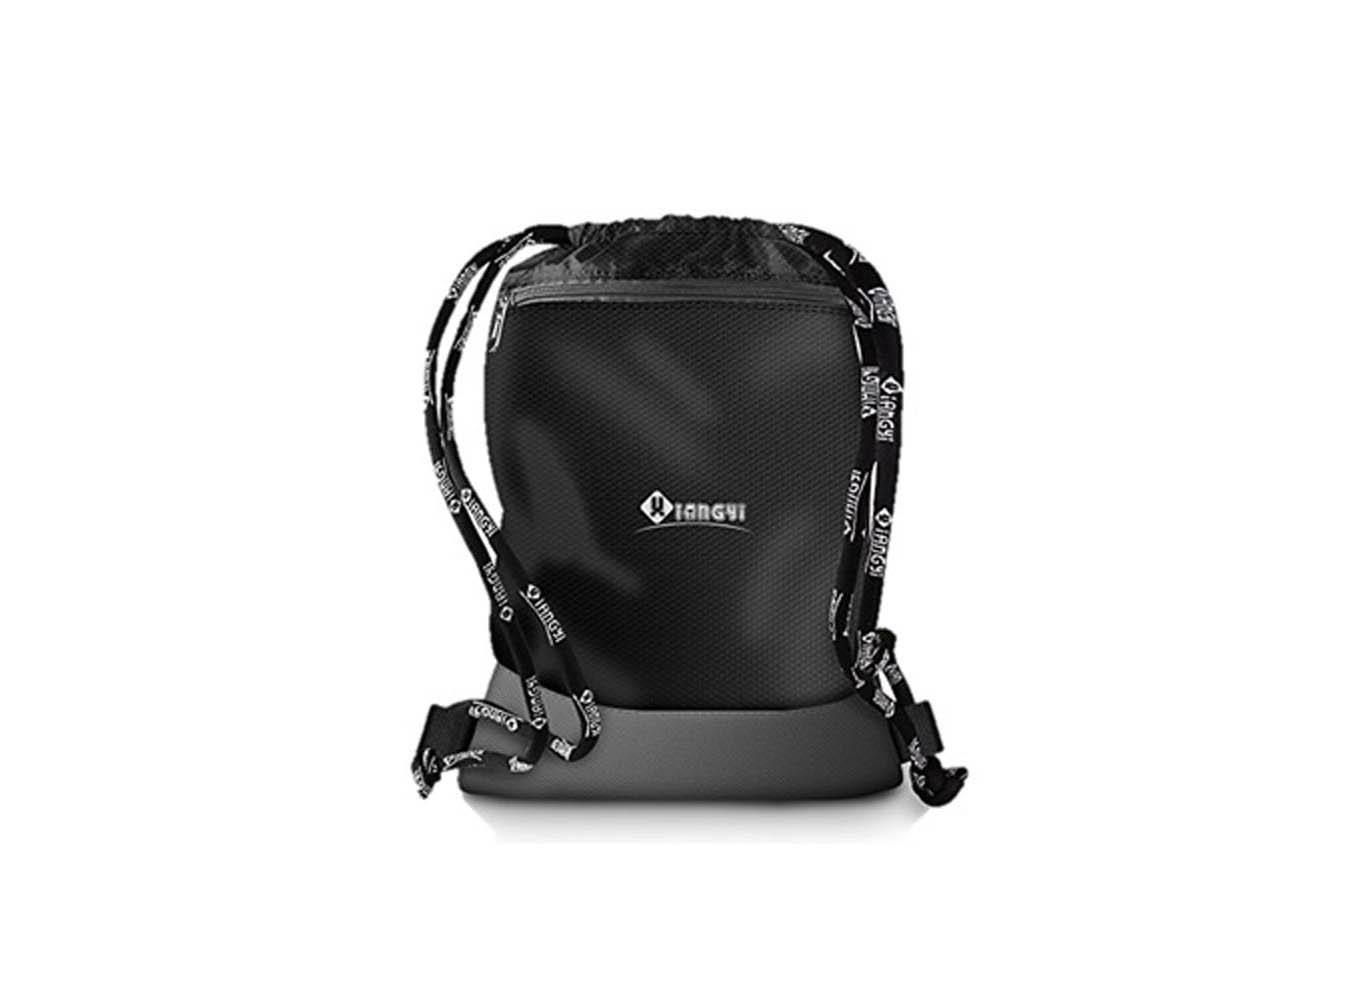 Custom Design Drawstring Bag w/ Zippered Front Pocket